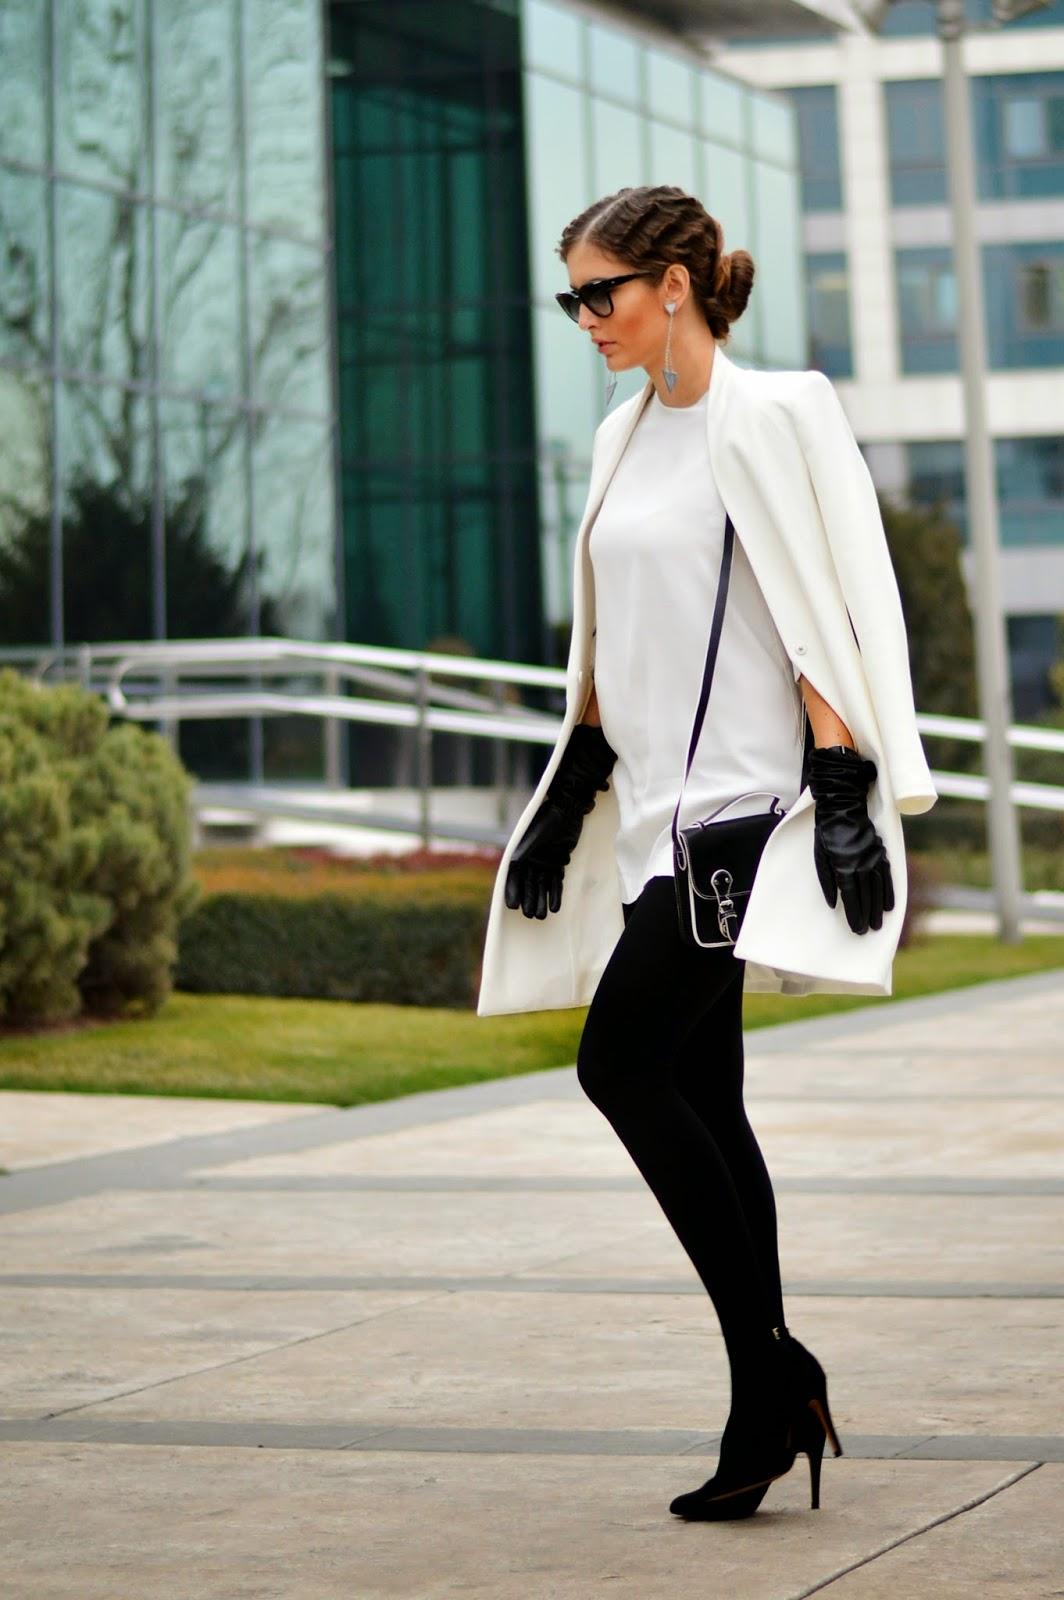 Fashionblogger streetstyle classic blackwhite Diotima 7 Modne blogerke: Najbolji modni stil nedelje